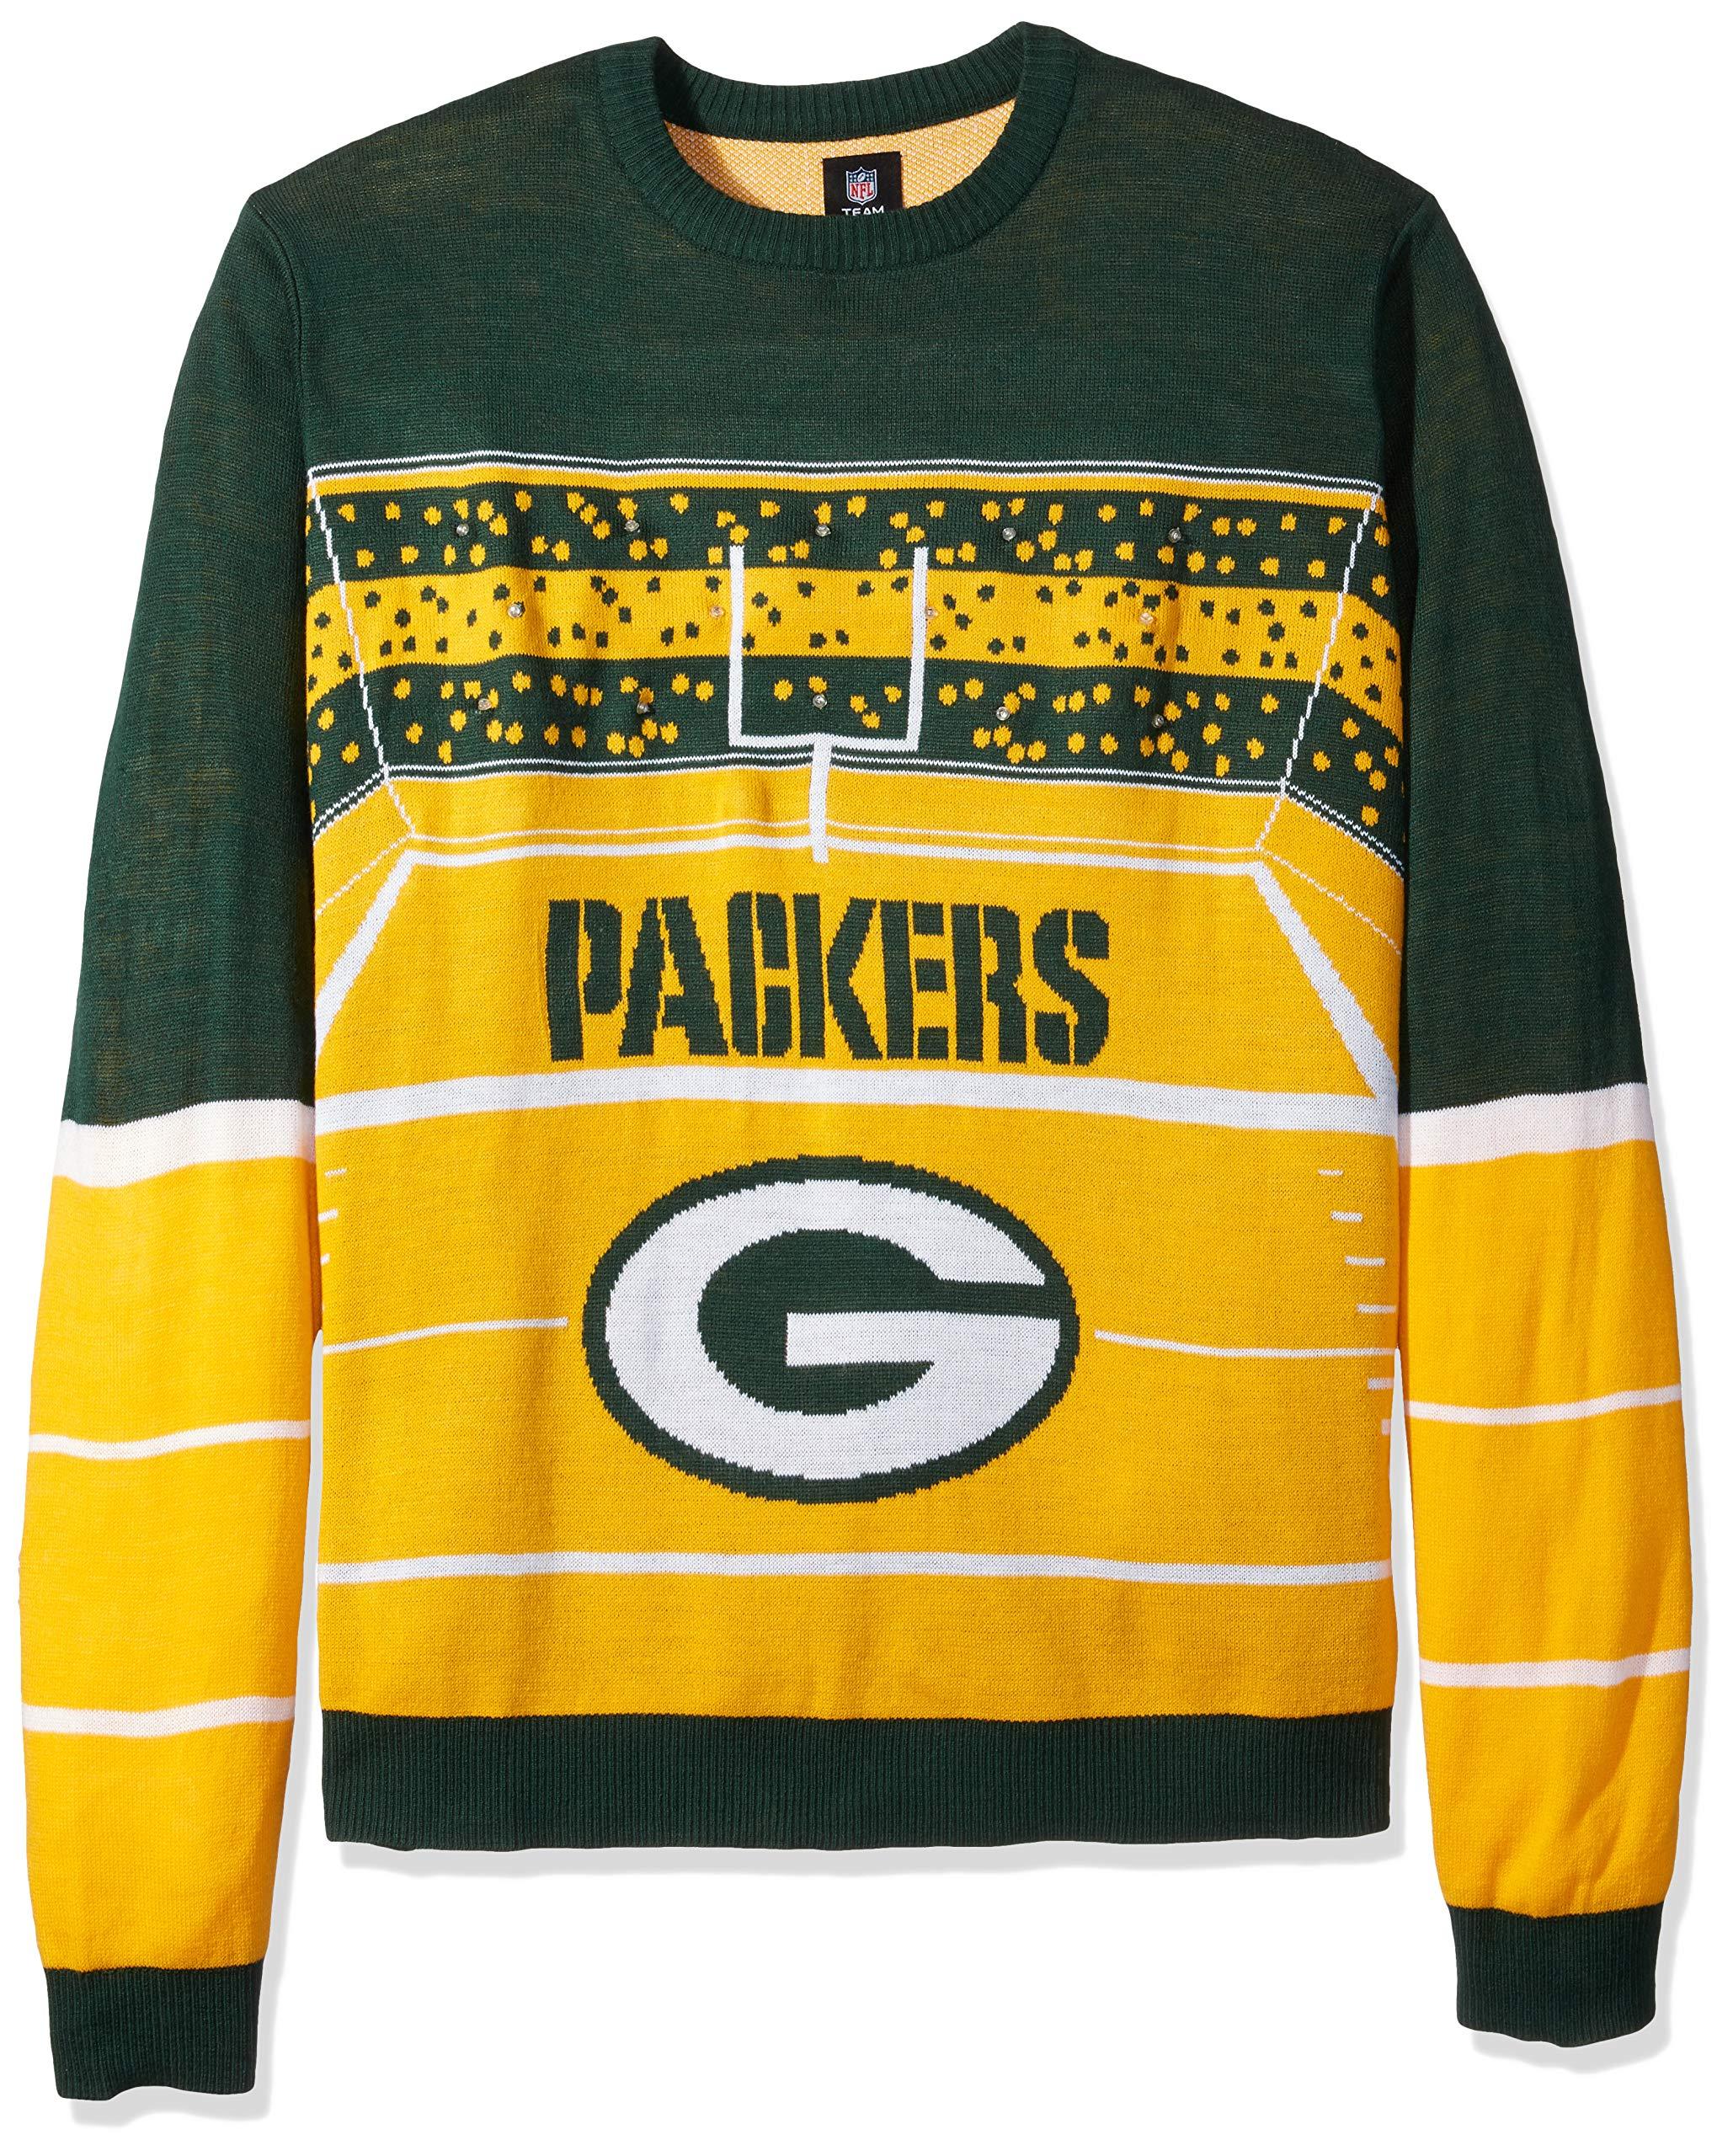 FOCO SWTCNNFSTDLU NFL Green Bay Packers Mens Stadium Light Up Crew Neck Sweaterstadium Light Up Crew Neck Sweater, Team Color, XX-Large